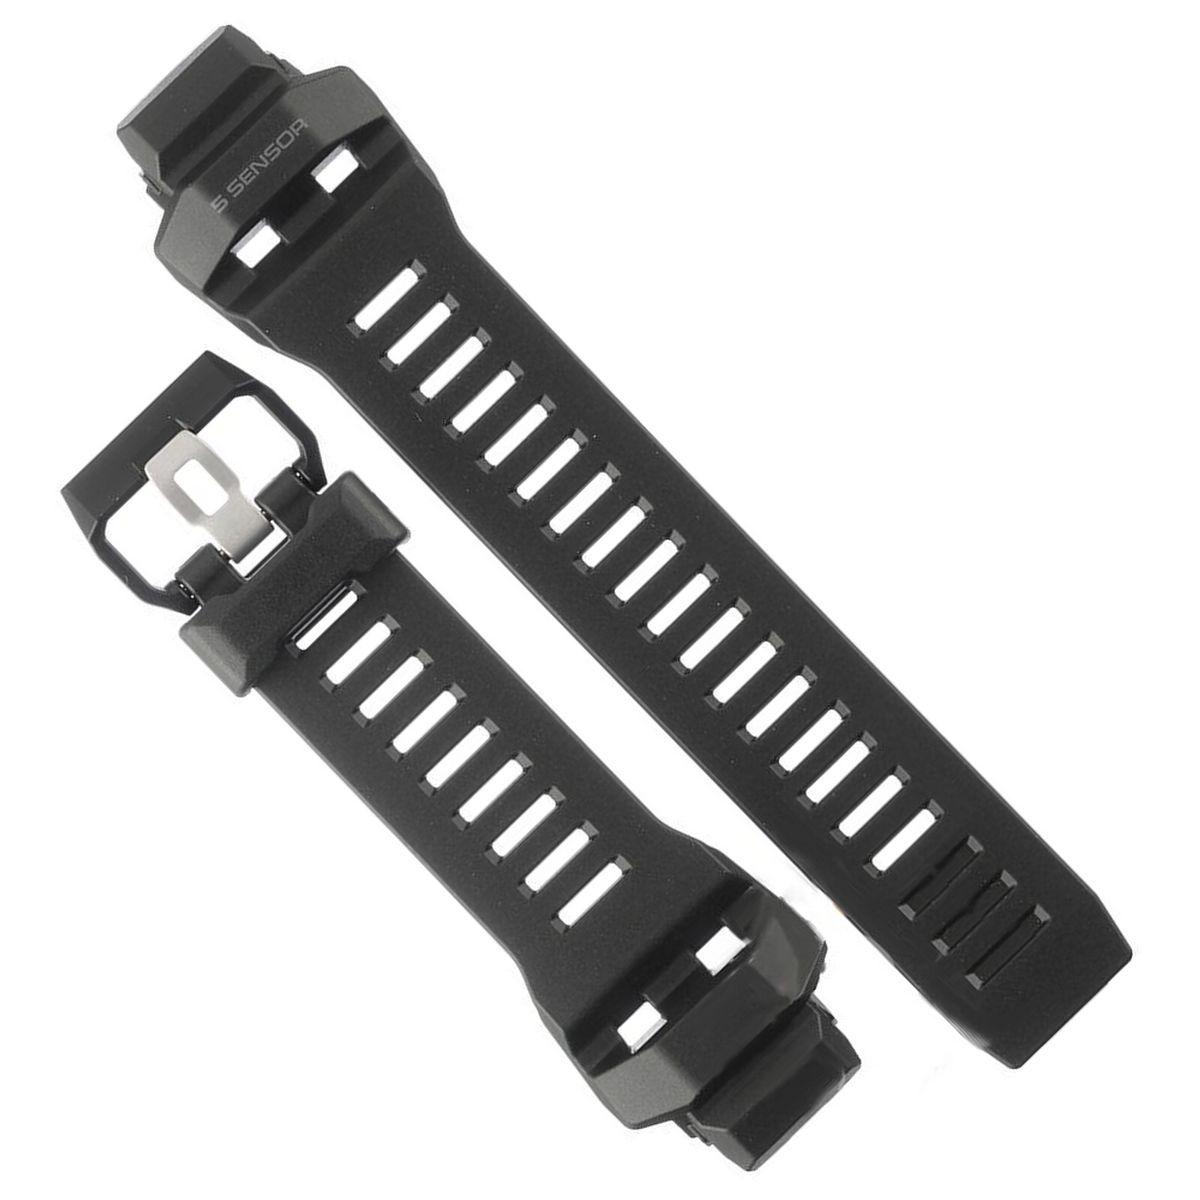 Pulseira Casio G-shock GBD-H1000-1 Preto Fosco  - E-Presentes